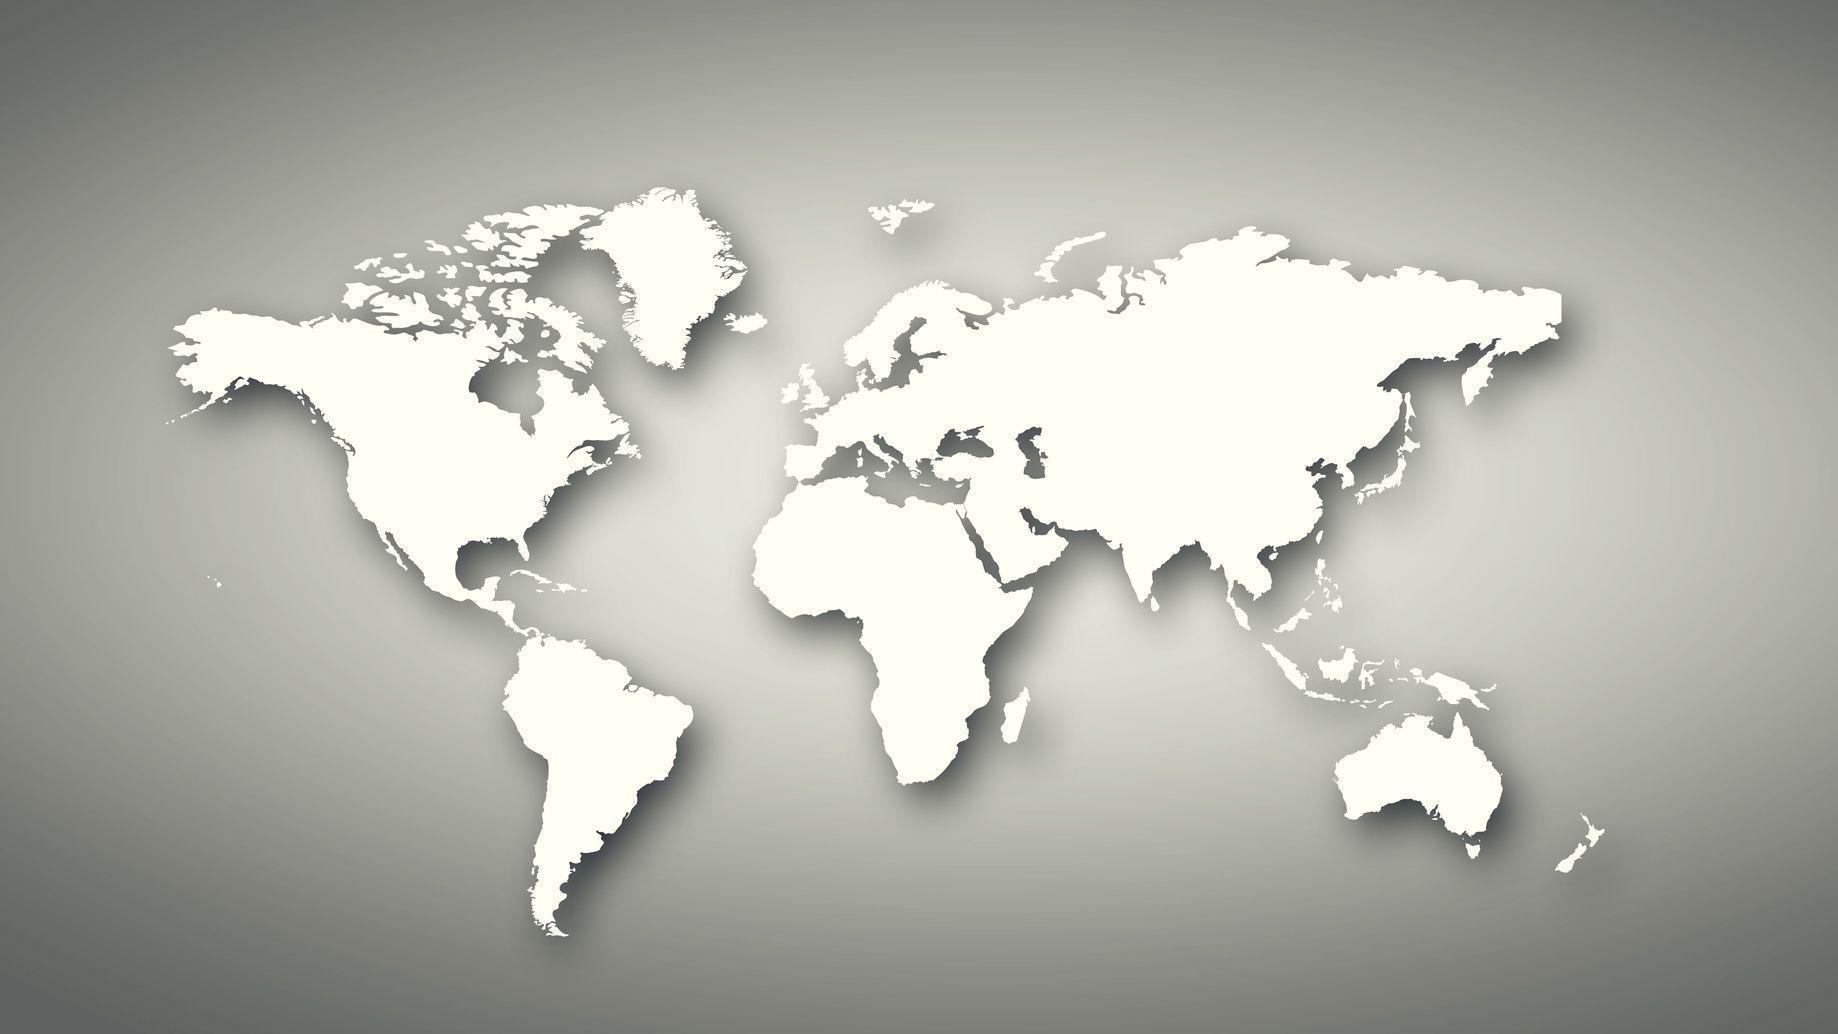 Exploration | World map